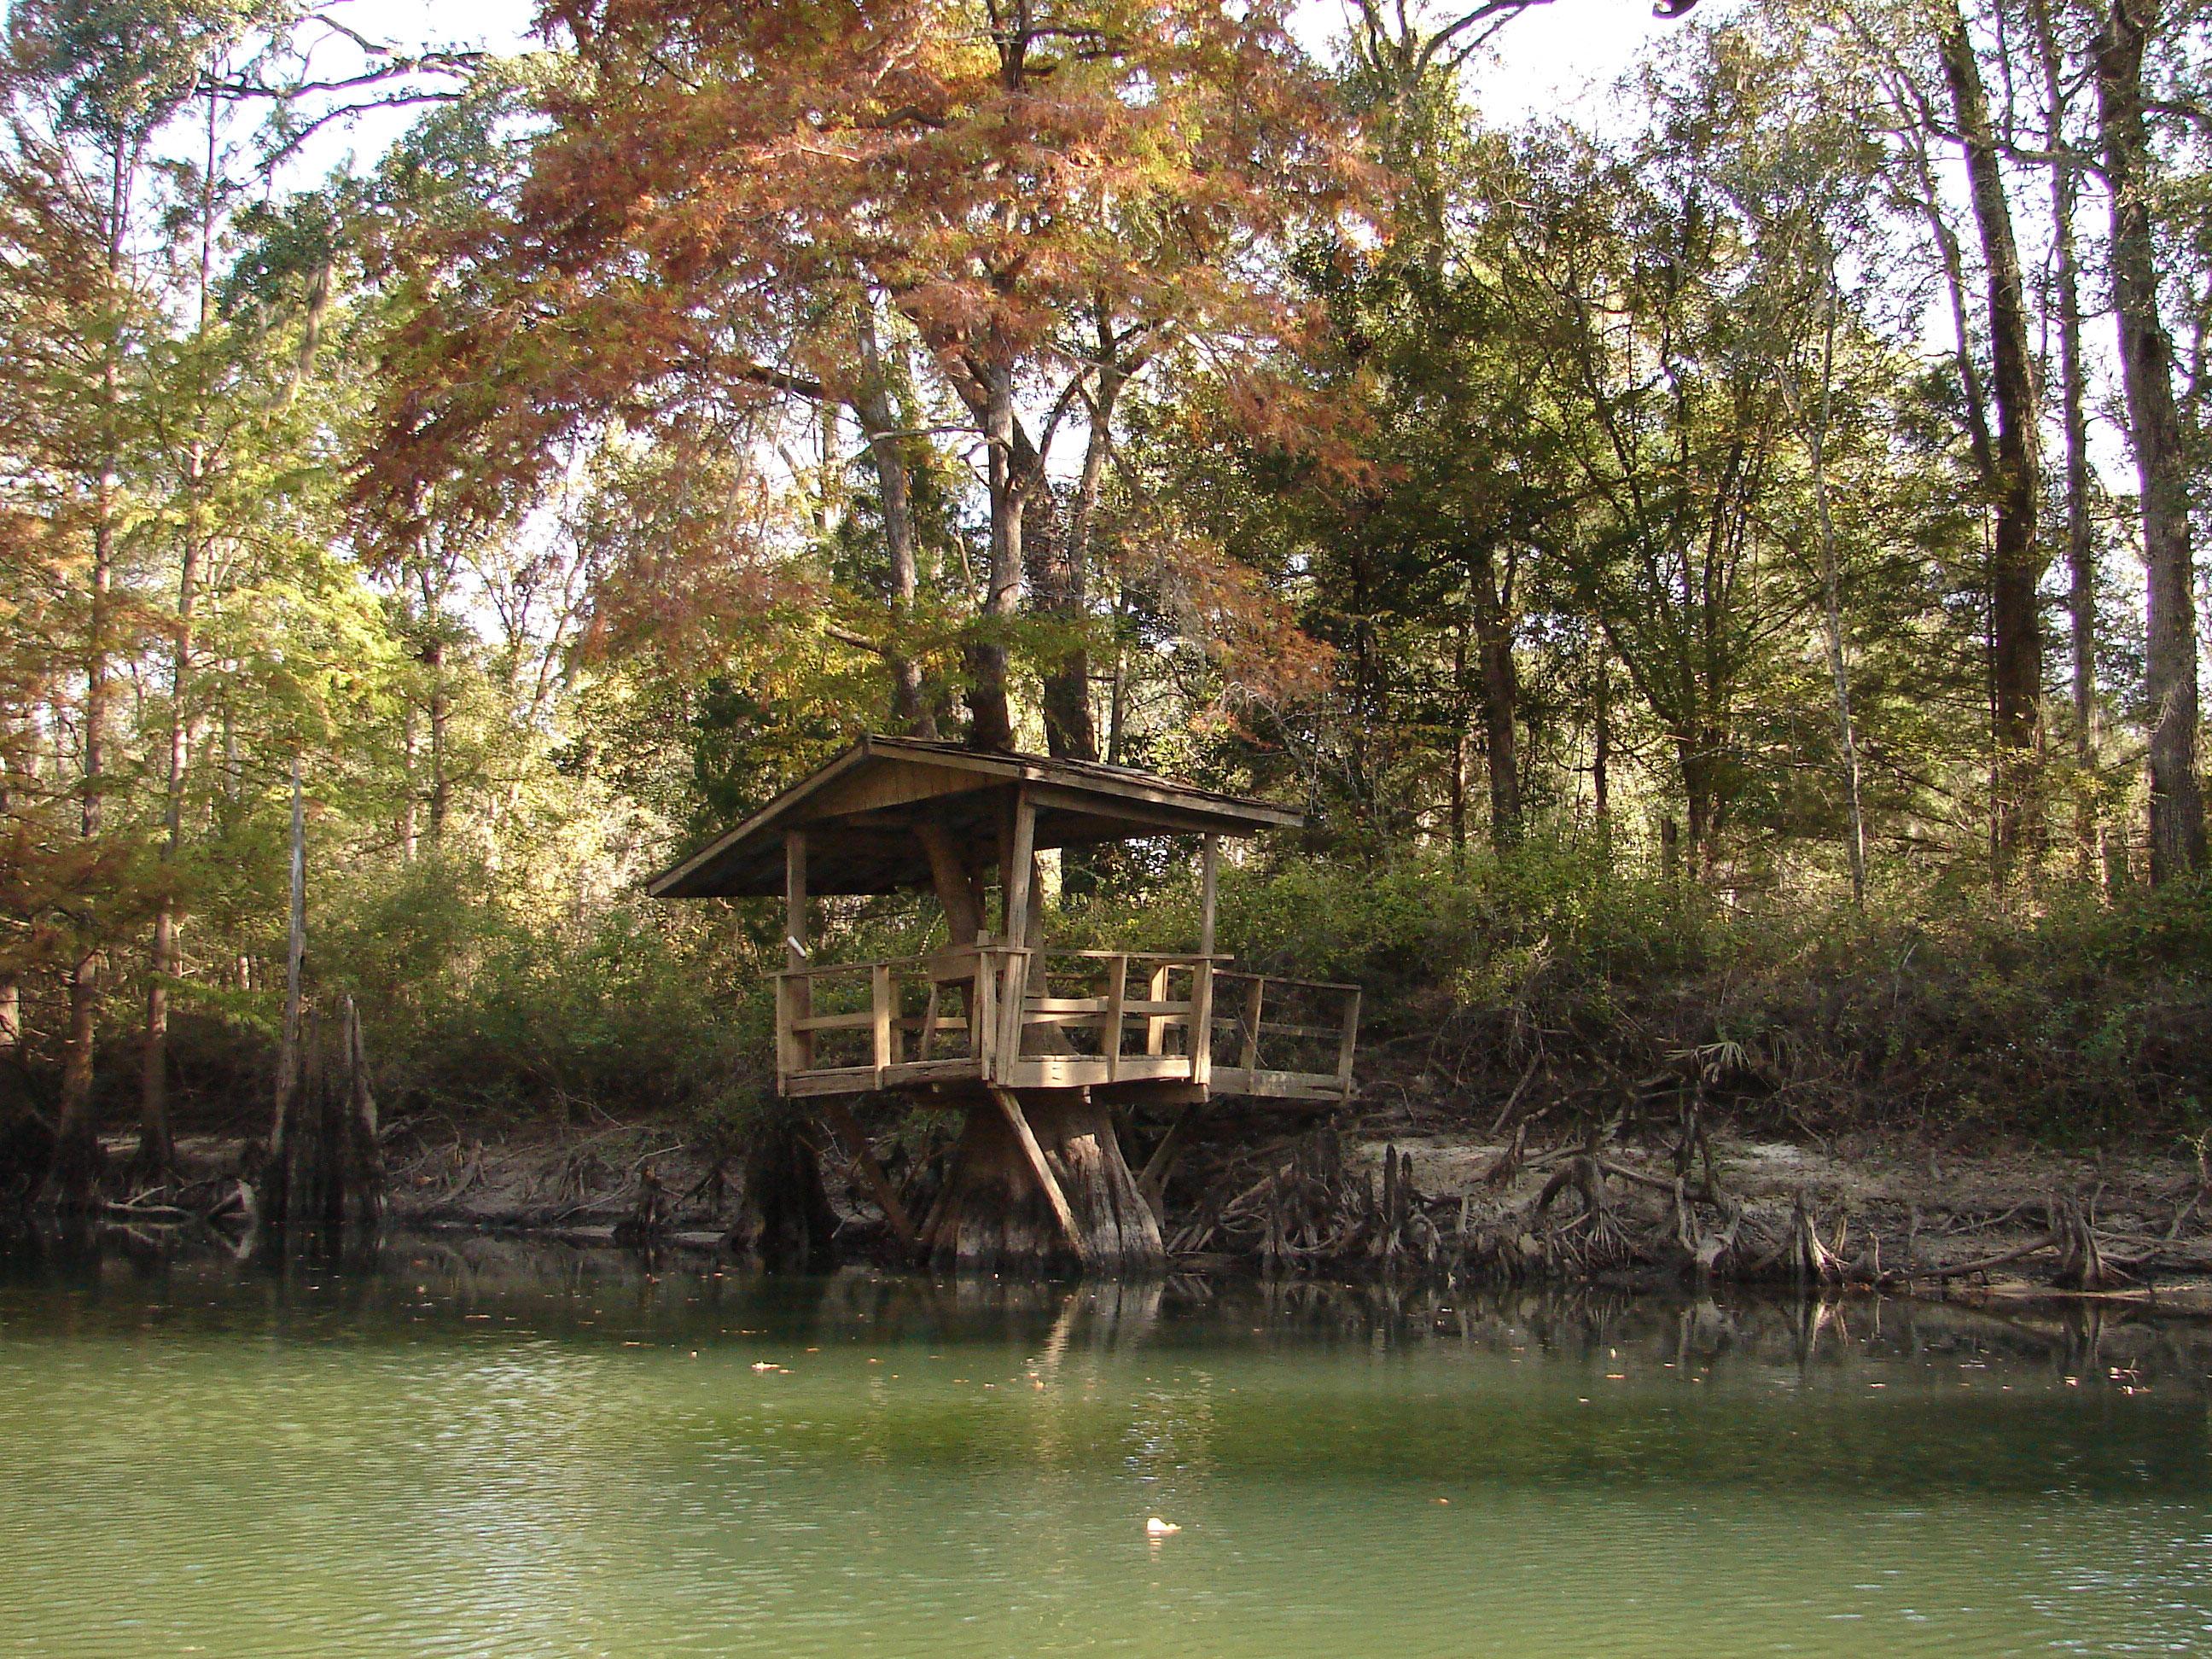 tree-house-fishing-fall-colors-stock-photos-florida-panhandle-chipola-river-linda-bateman